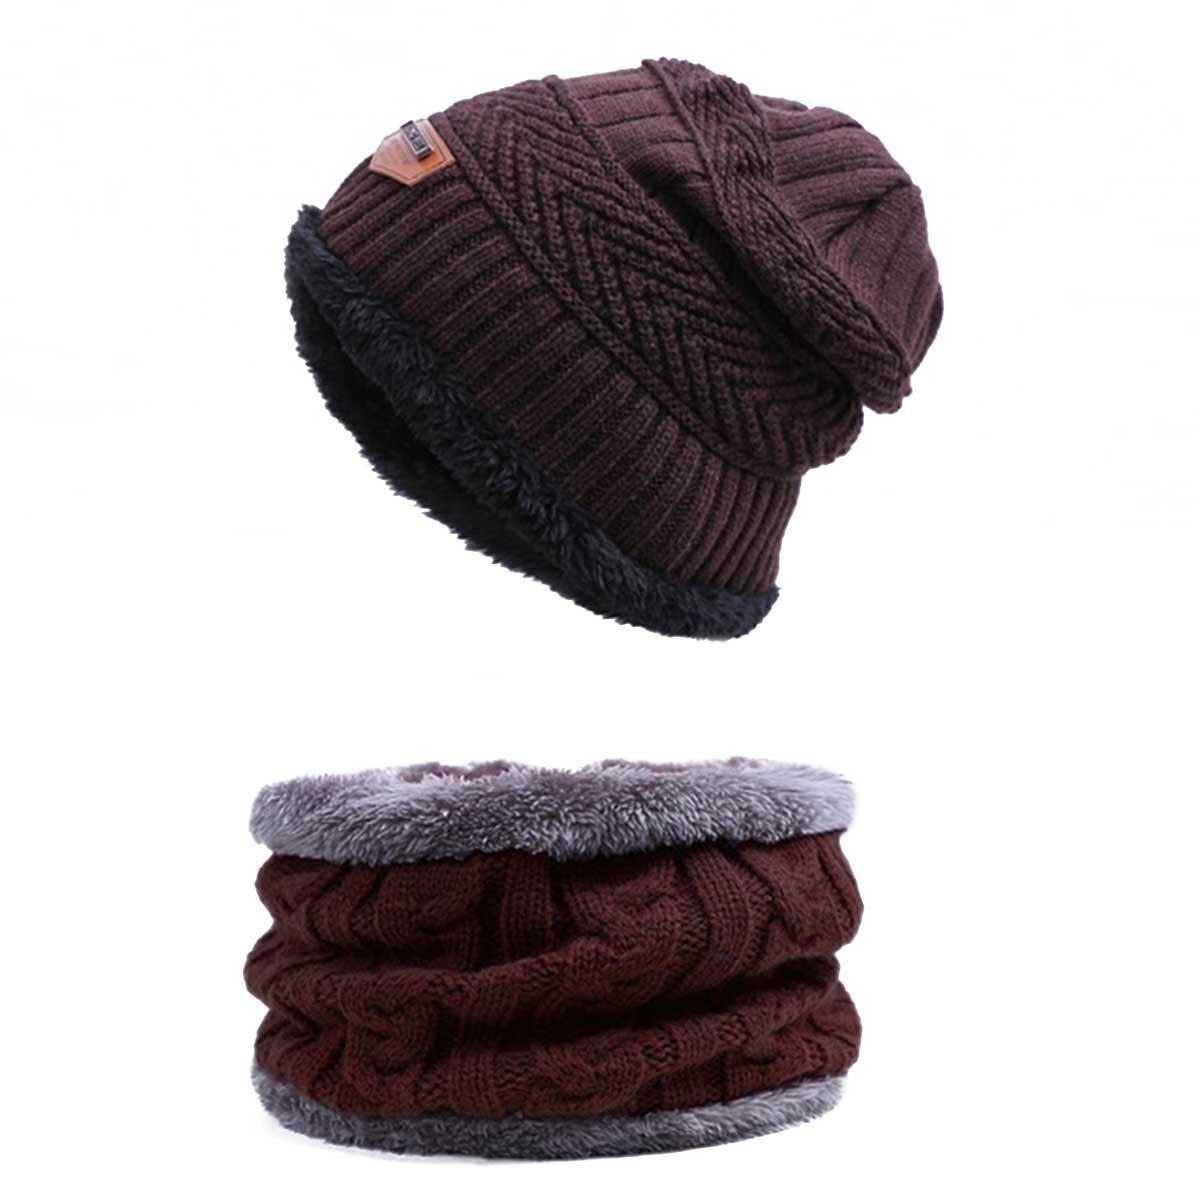 Winter Hat Knitting Hat Scarf Set Warm Wool Cap Scarves Winter Outdoor Accessories